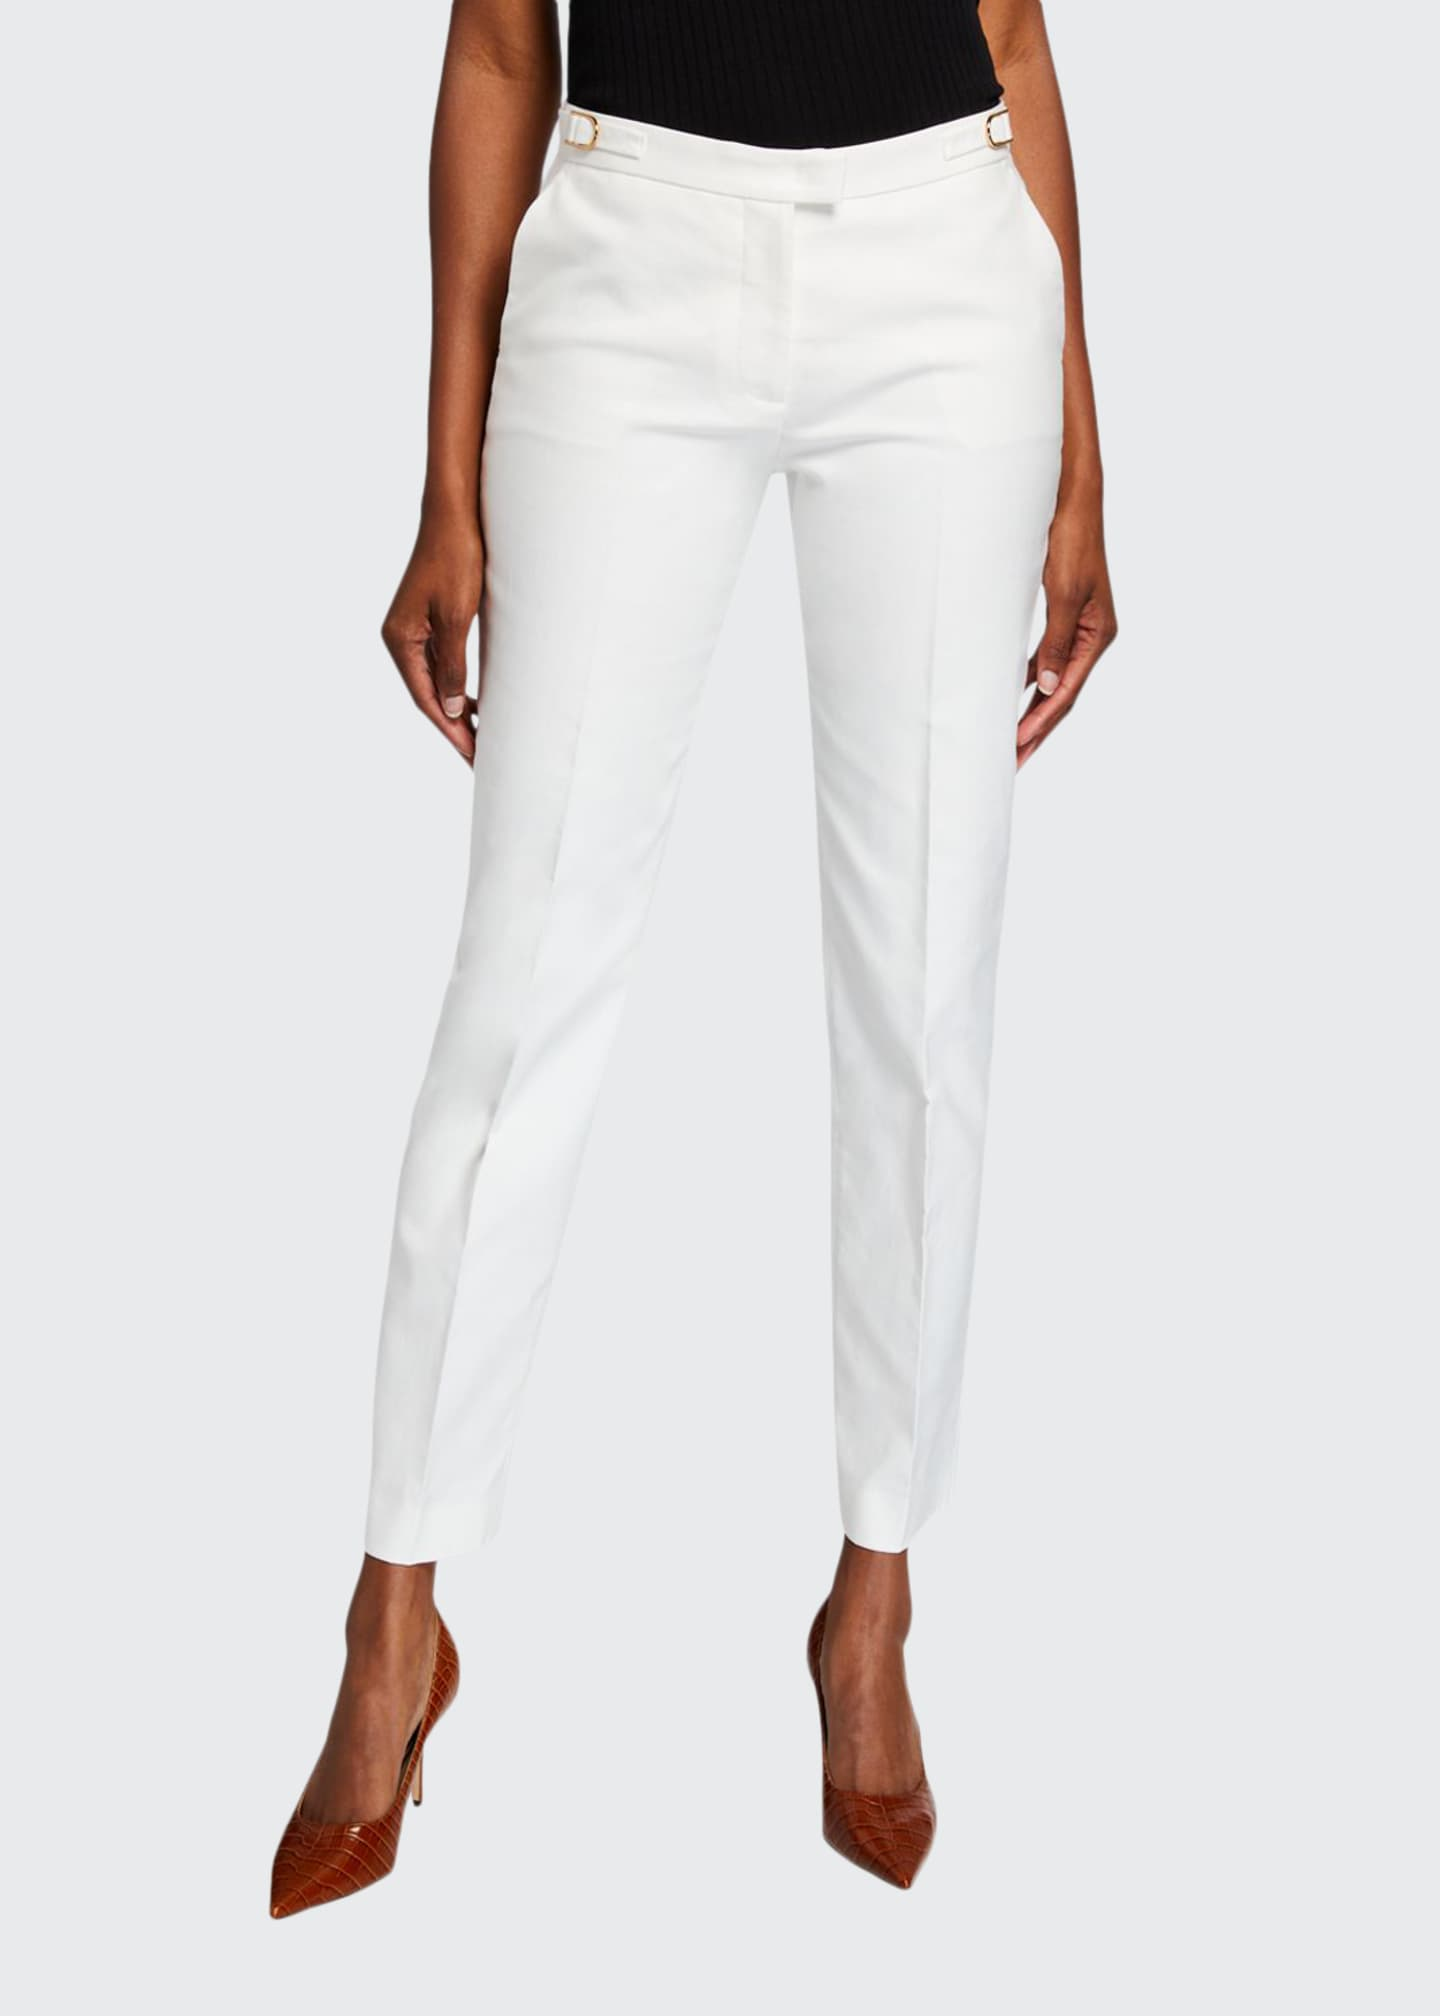 Gabriela Hearst Armon Slim-Leg Pants